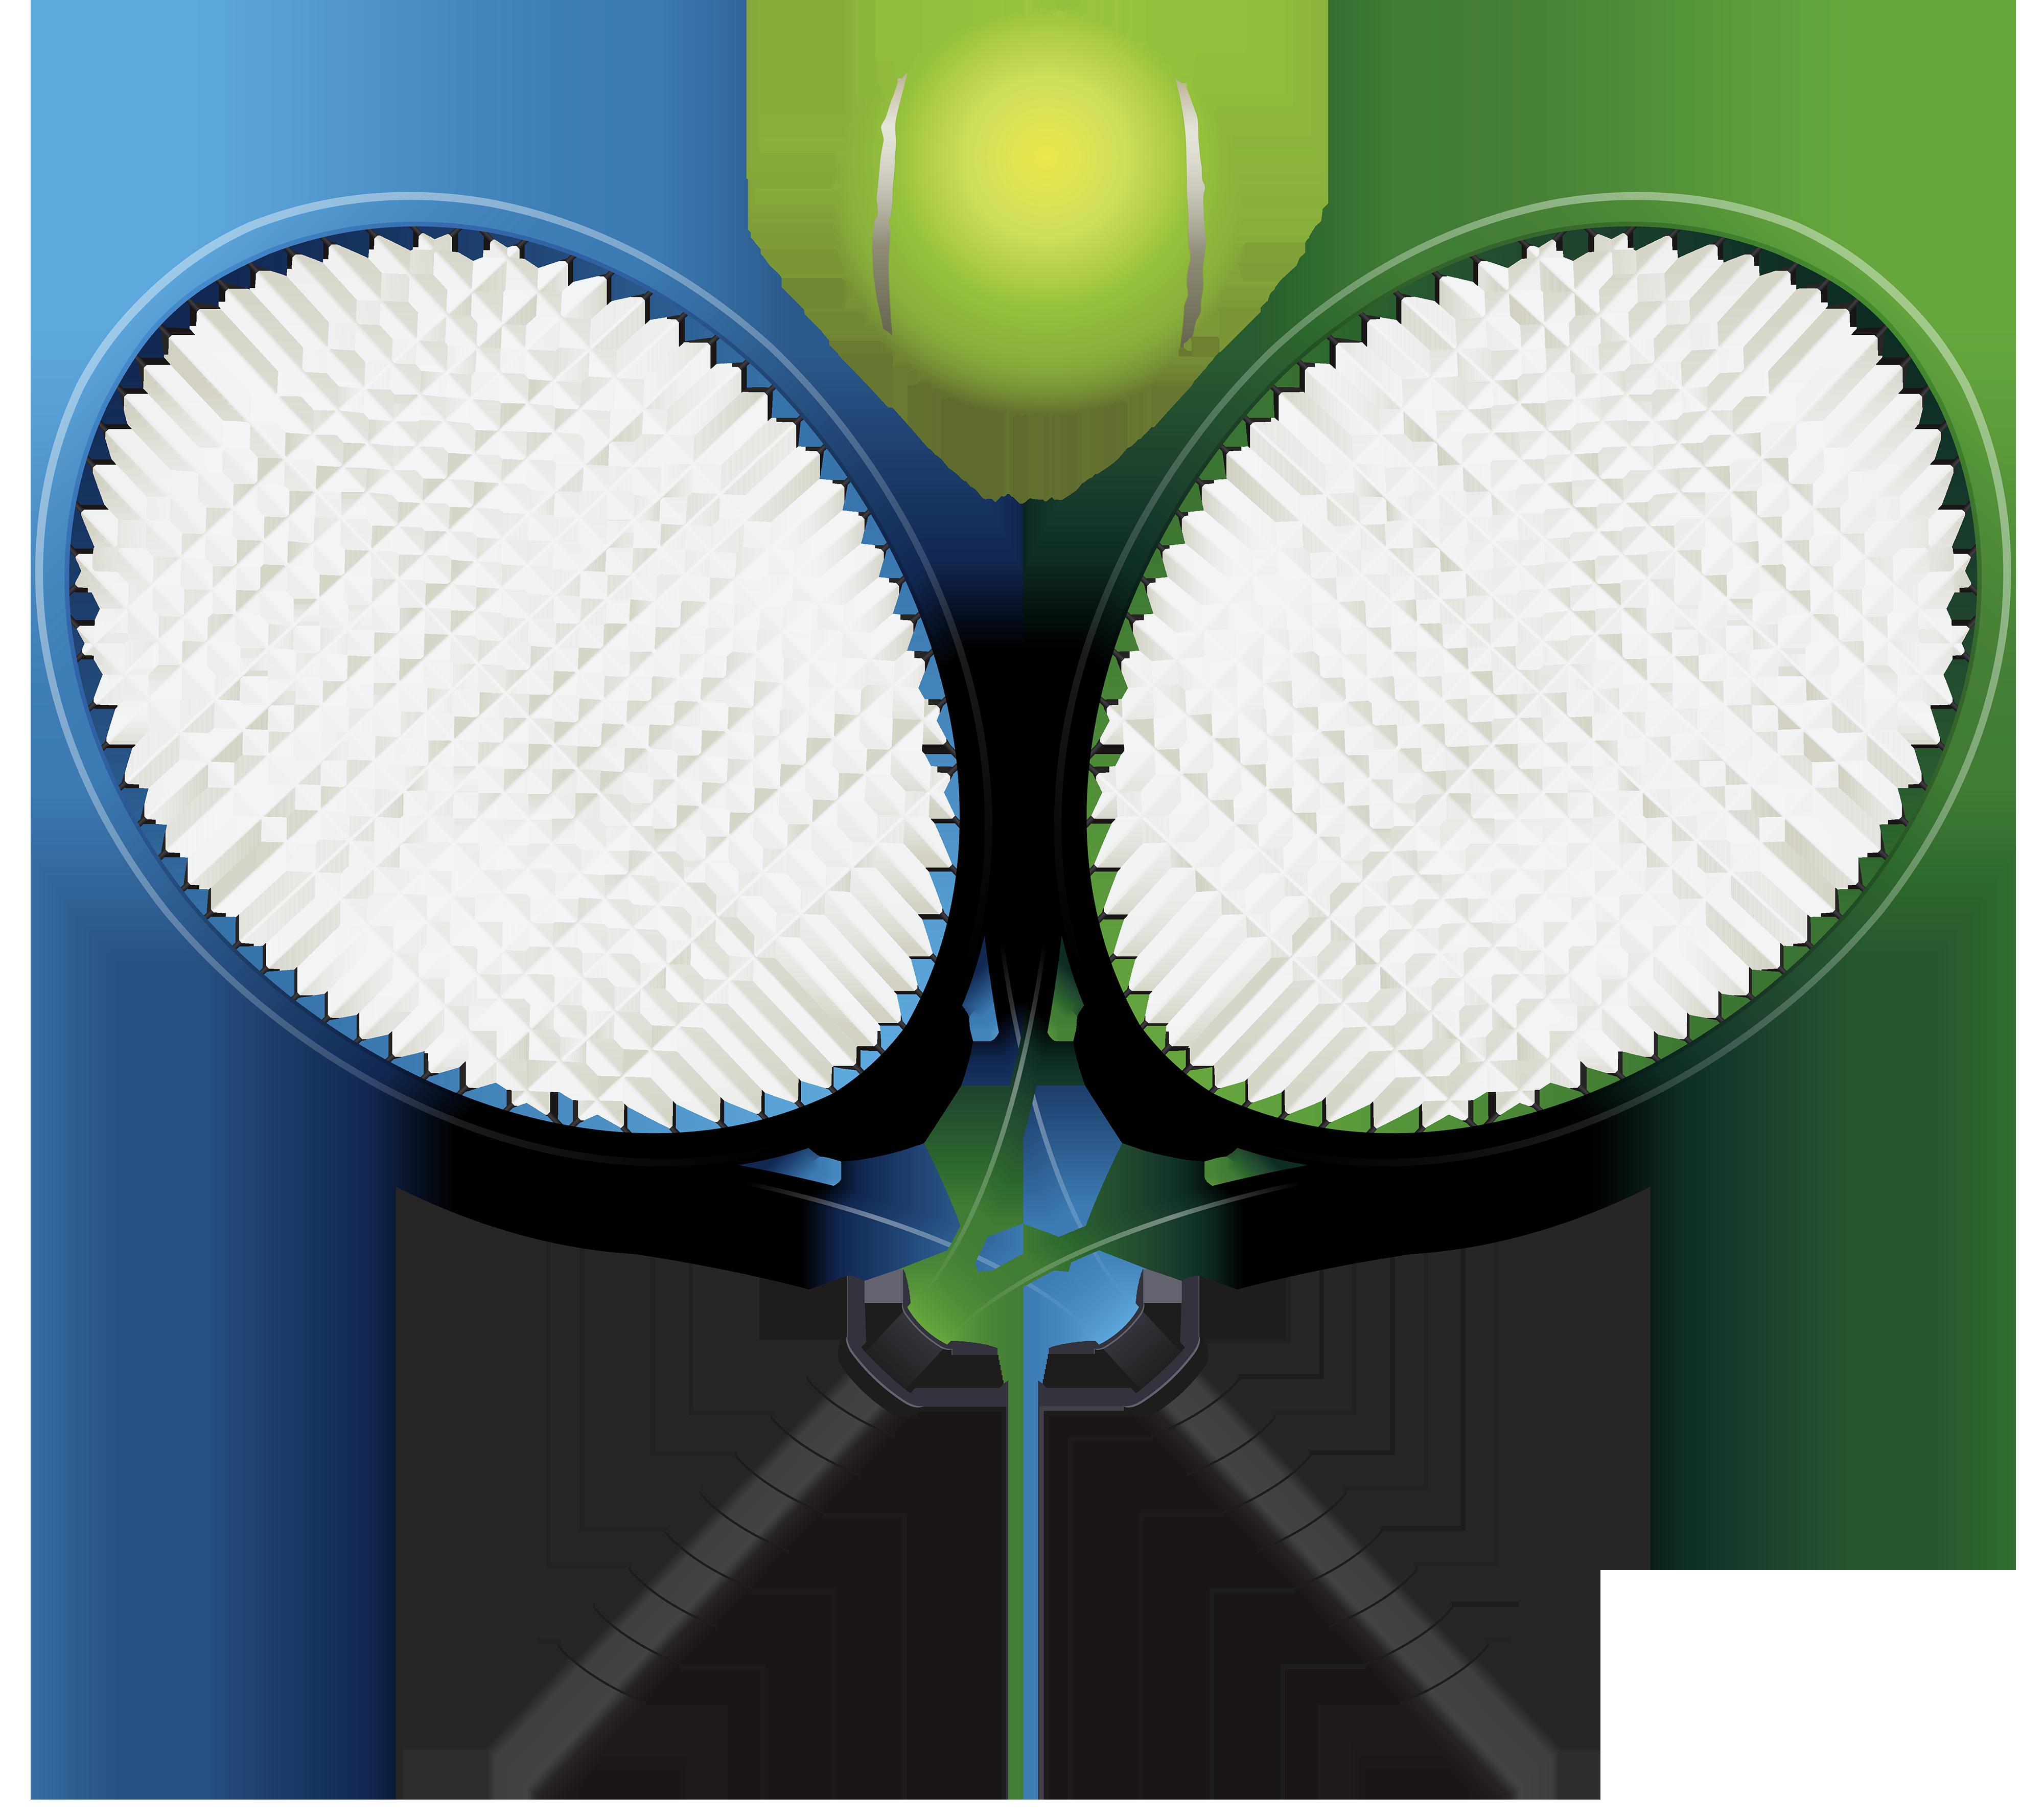 4000x3559 Tennis Ball Clipart Tennis Racket